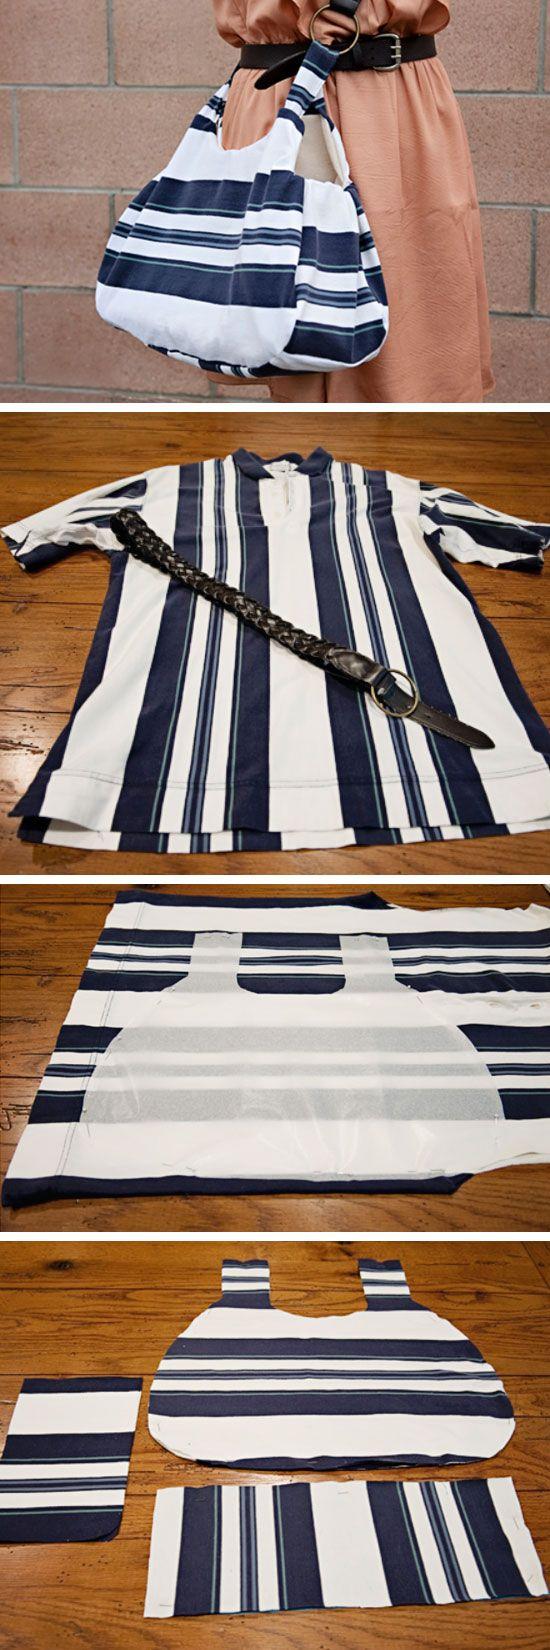 Up-cycle An Old Polo Shirt Into a Stylish New Bag | Click Pic for 22 DIY Christmas Gift Ideas for Mom | Handmade Christmas Gifts for Grandma